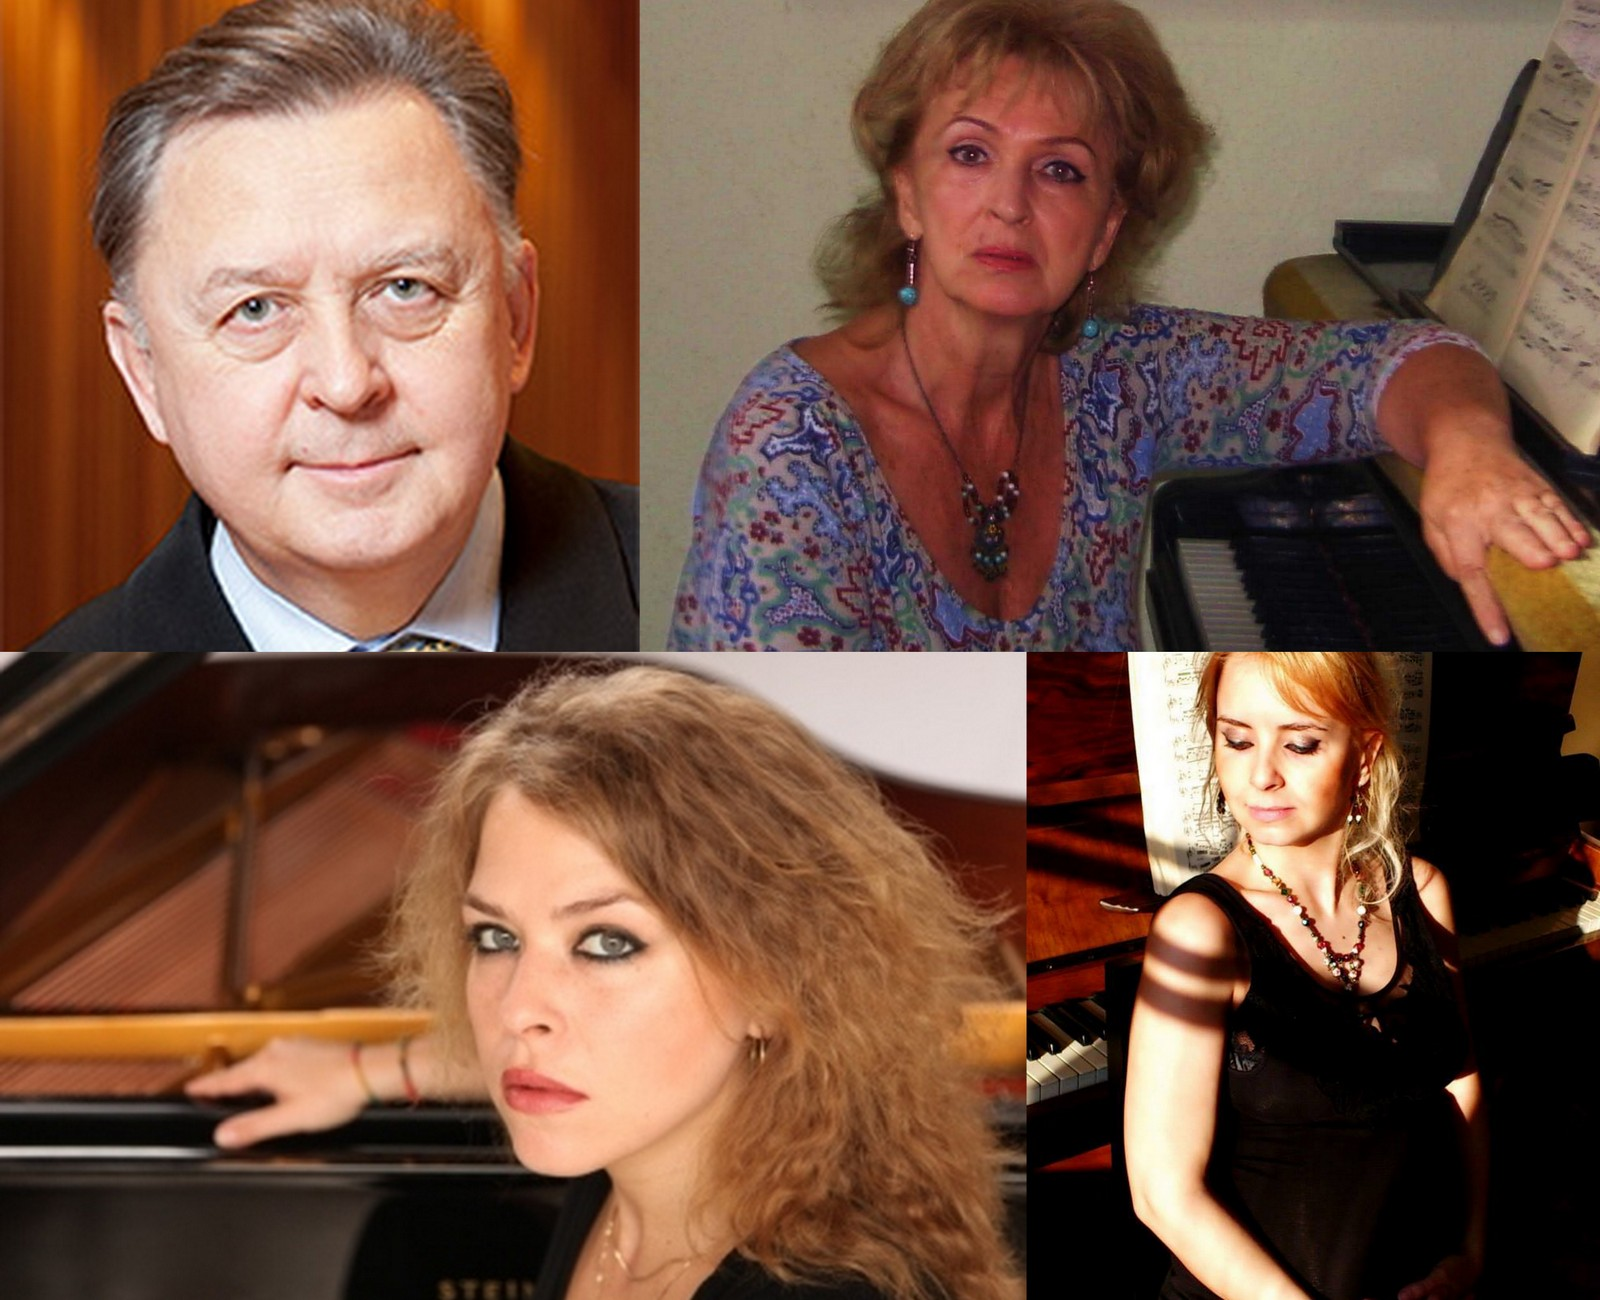 Zongorista-generációk - A Falvai család koncertje